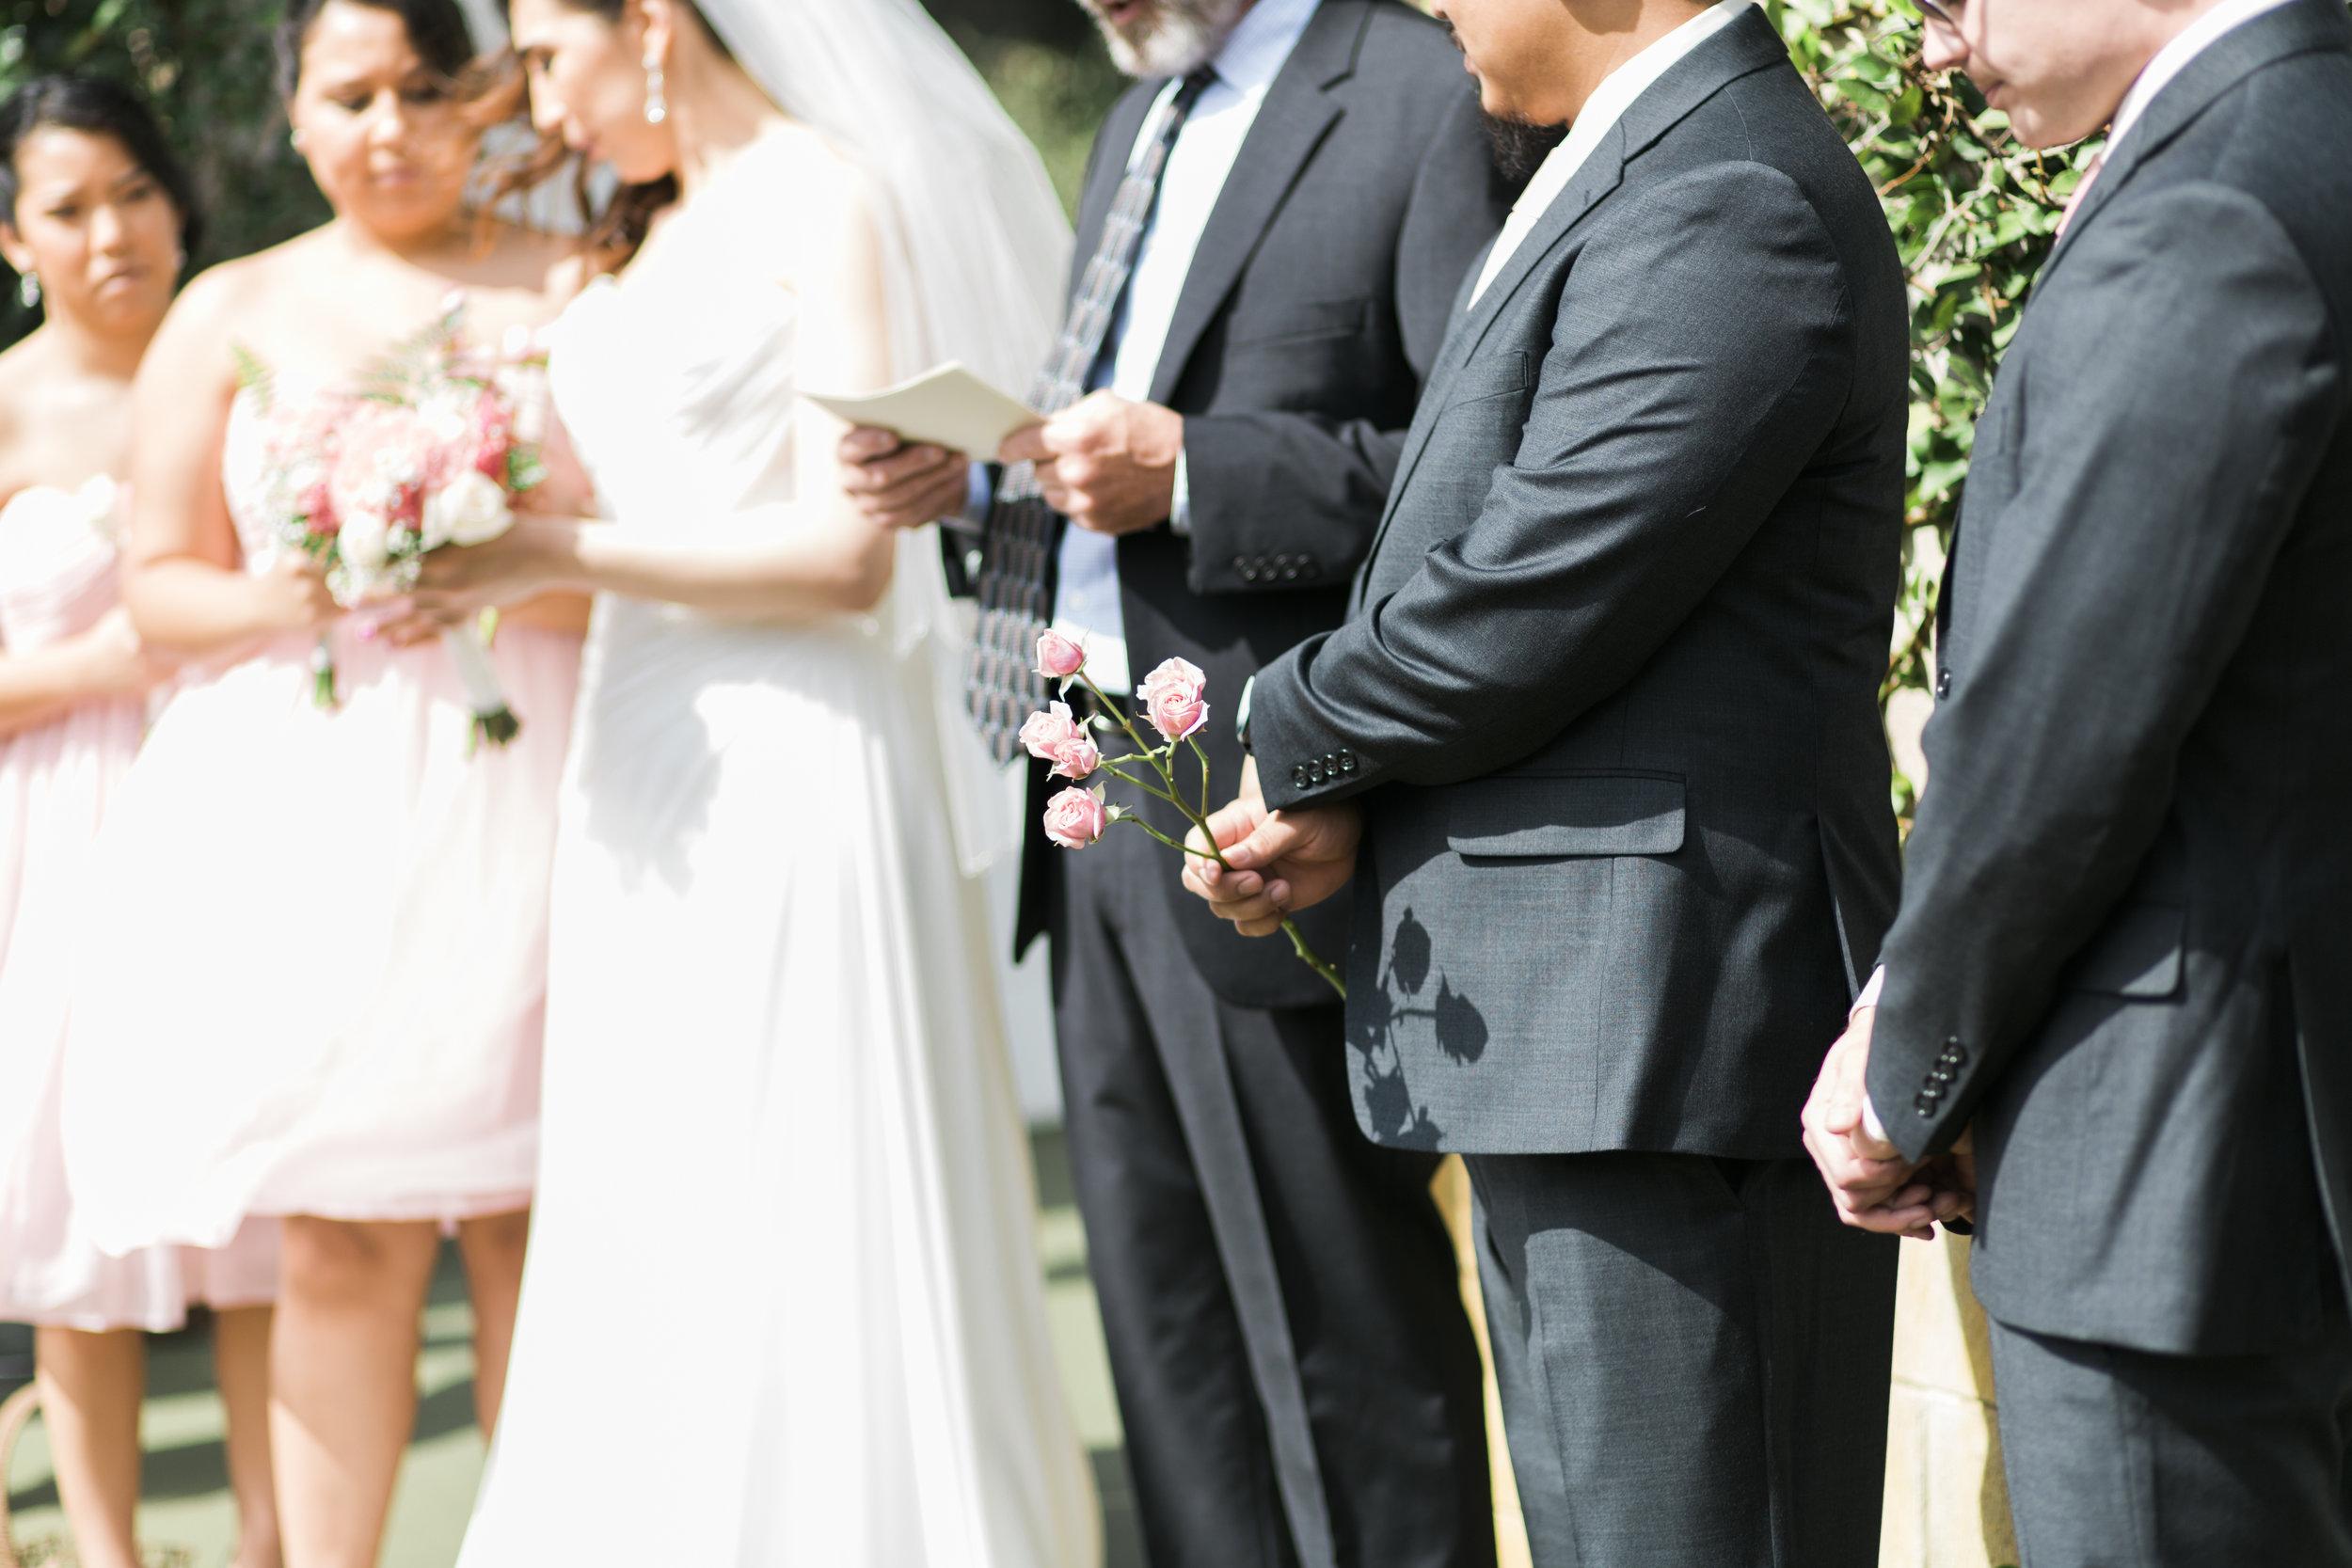 Veronica + Mark - The Acre Orlando - Sarasota Wedding Photography - Ceremony Photos - Emily & Co. Photography (50).jpg